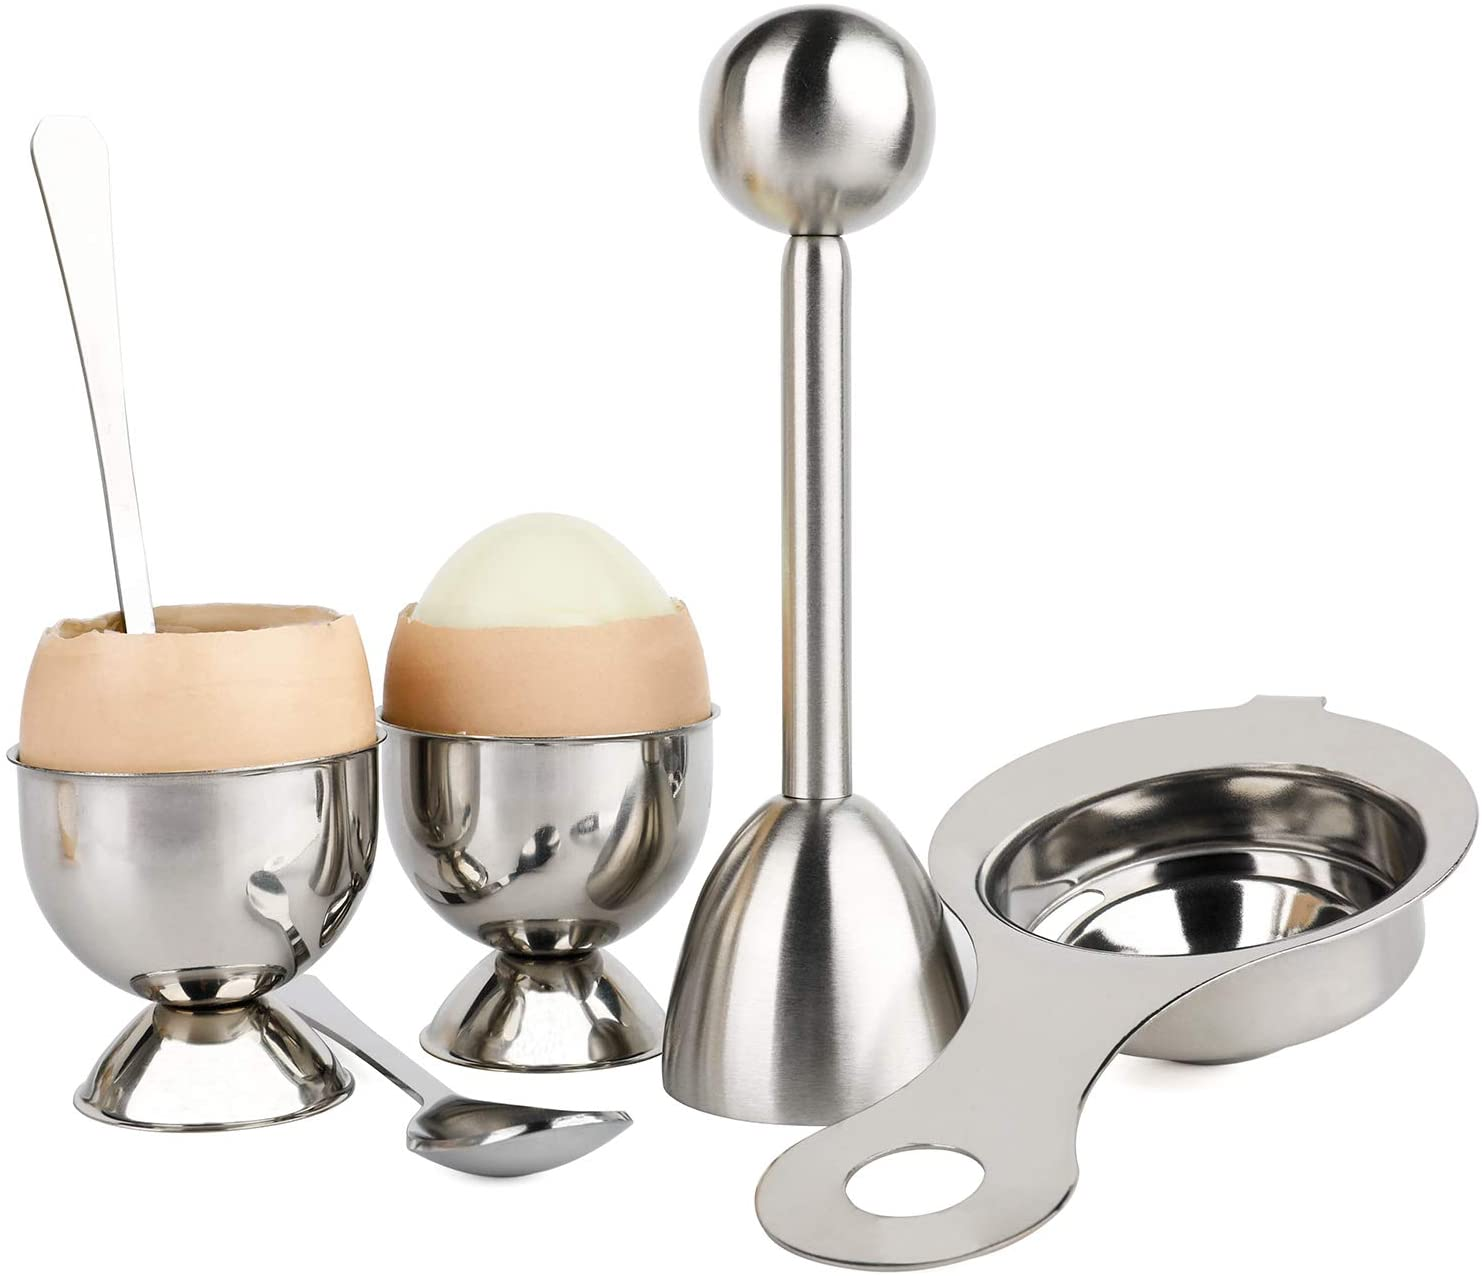 Egg Cracker Topper Set for Soft Hard Boiled Eggs Separator Holder Include 1 Egg Cutter Shell Remover 2 Cups 2 Spoons and 1 Separator